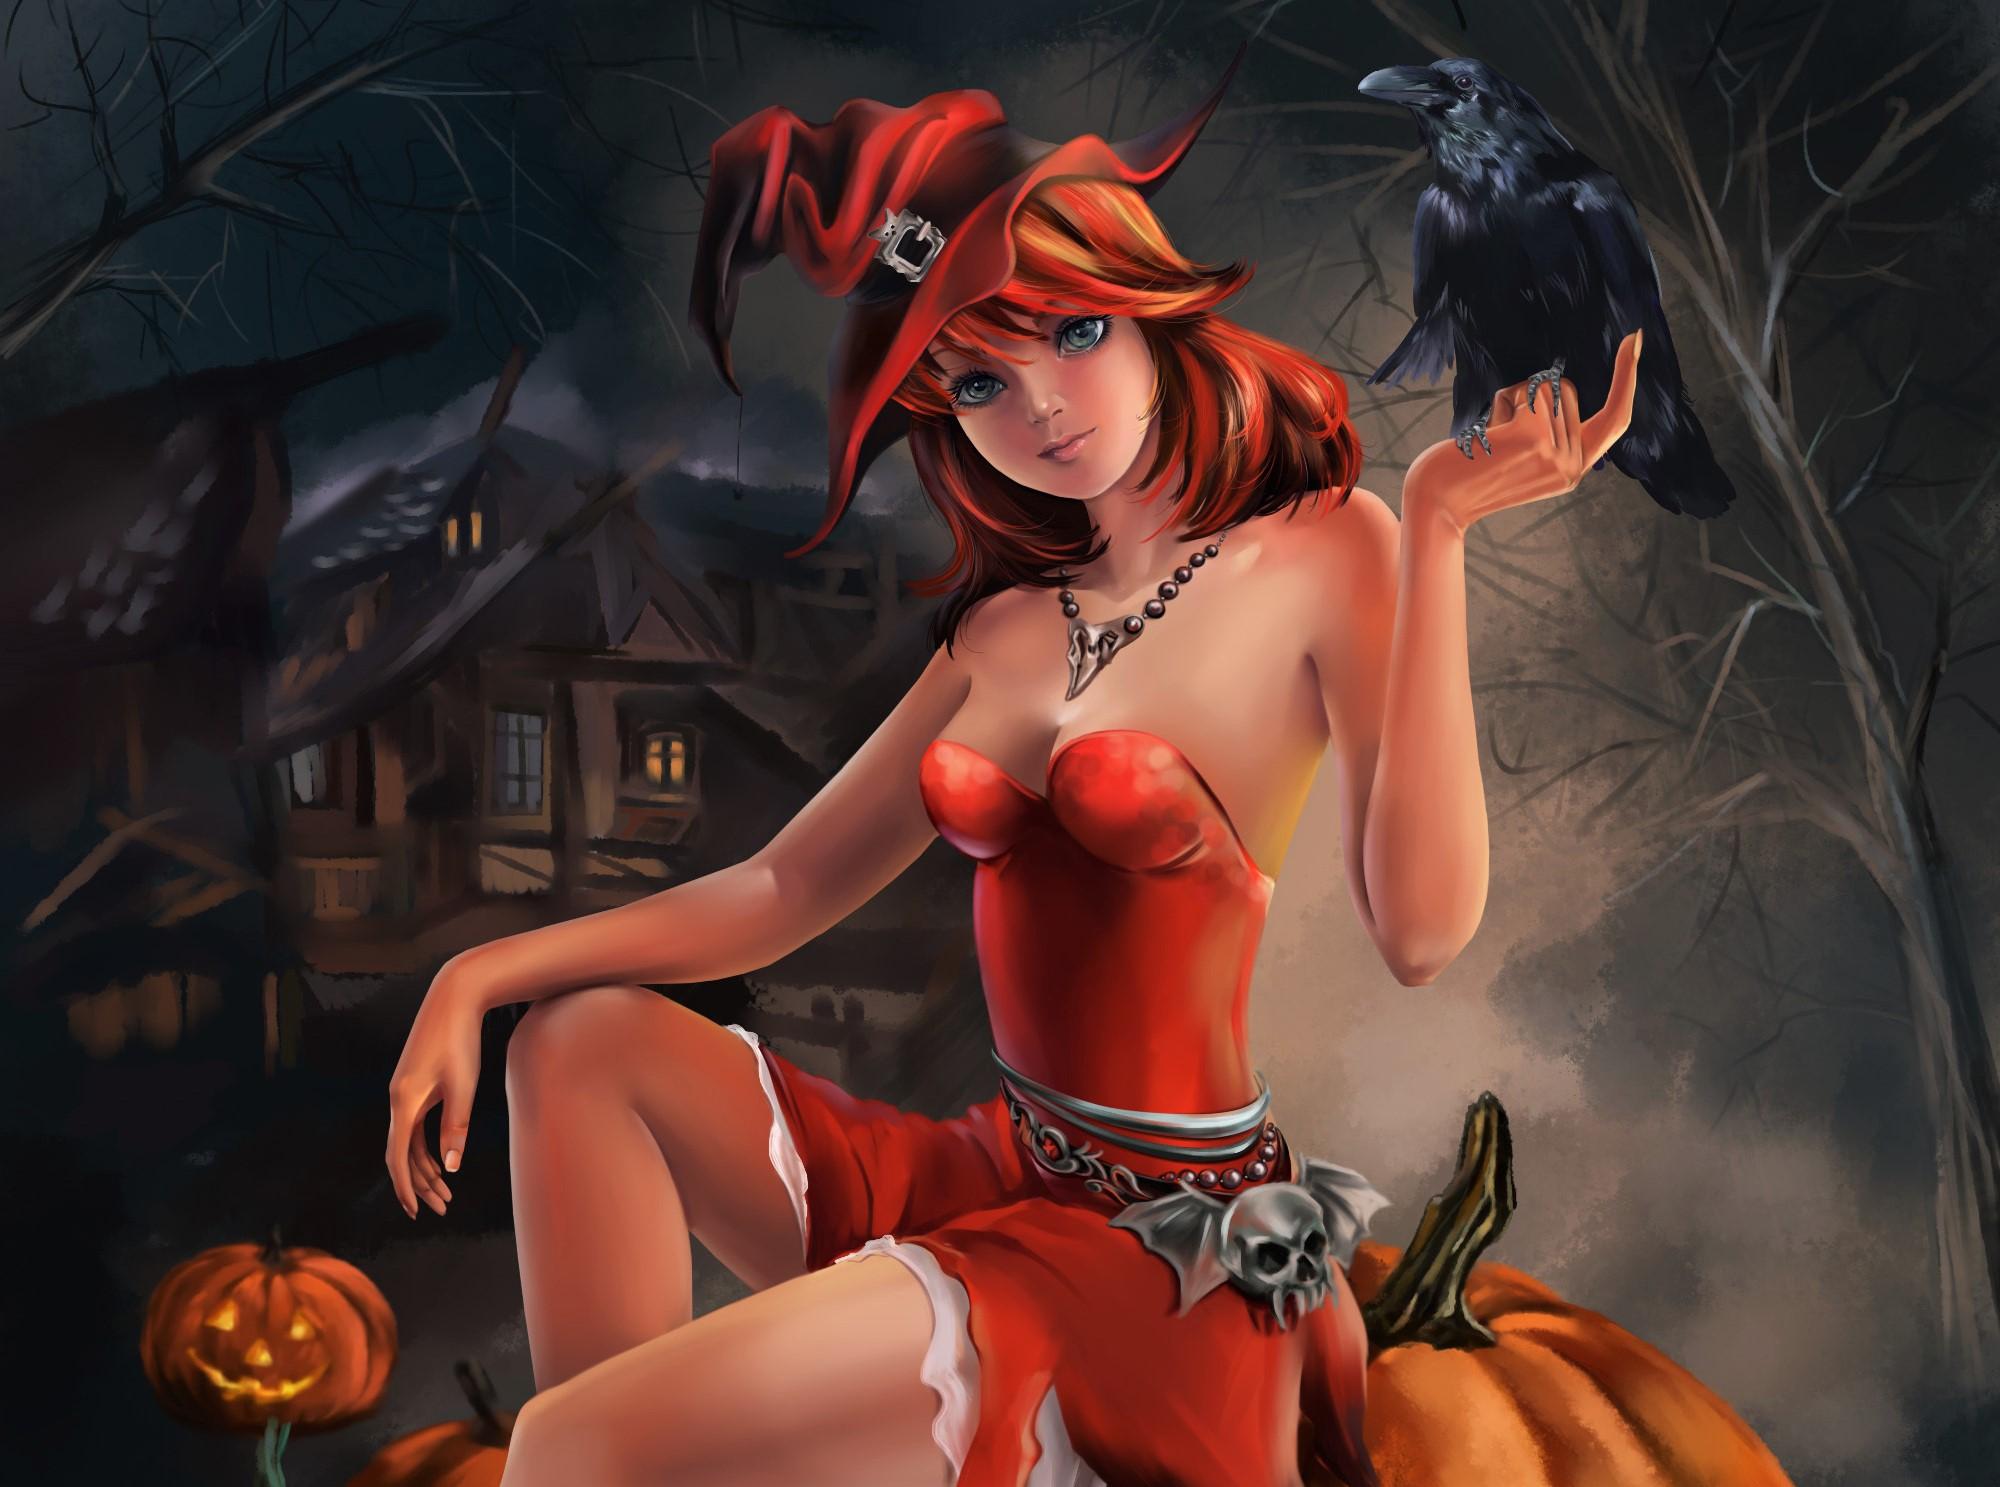 Halloween Haunted House Holiday Jack O 039 Lantern Orange Hair Raven Skull Witch Witch Hat 2000x1487